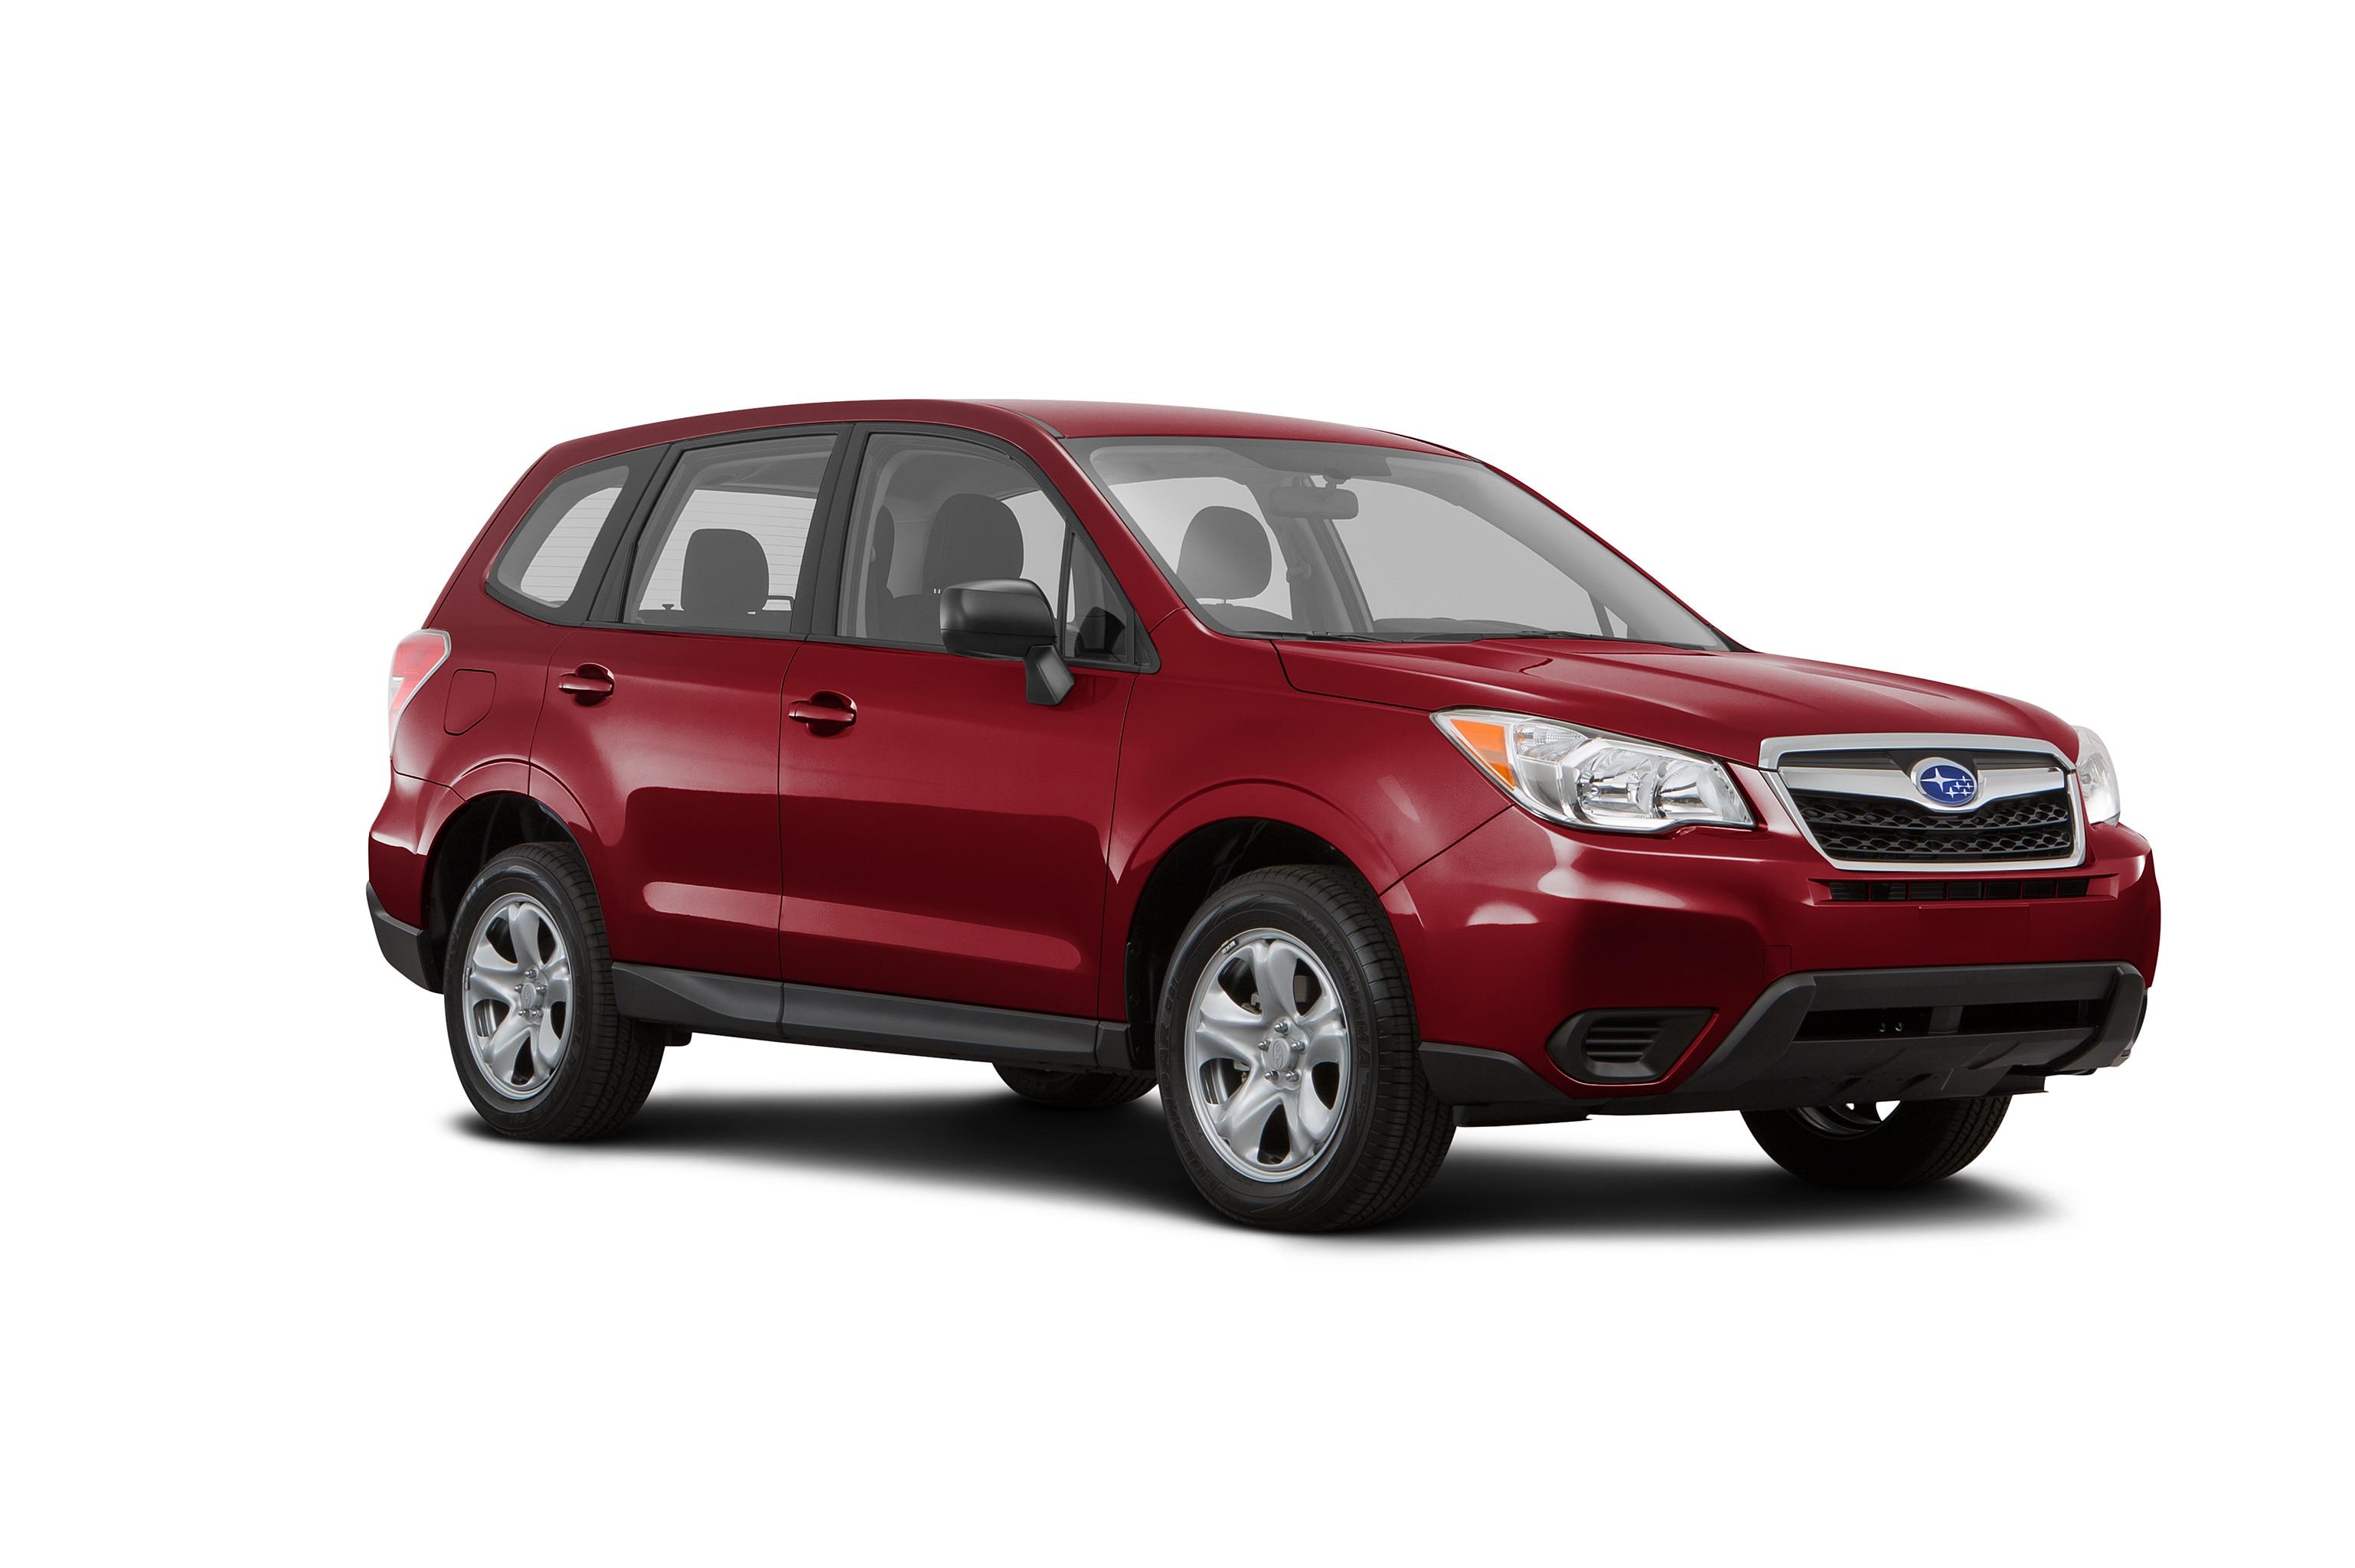 Fred Beans Subaru >> Subaru Special Offers Doylestown Pa Fred Beans Subaru